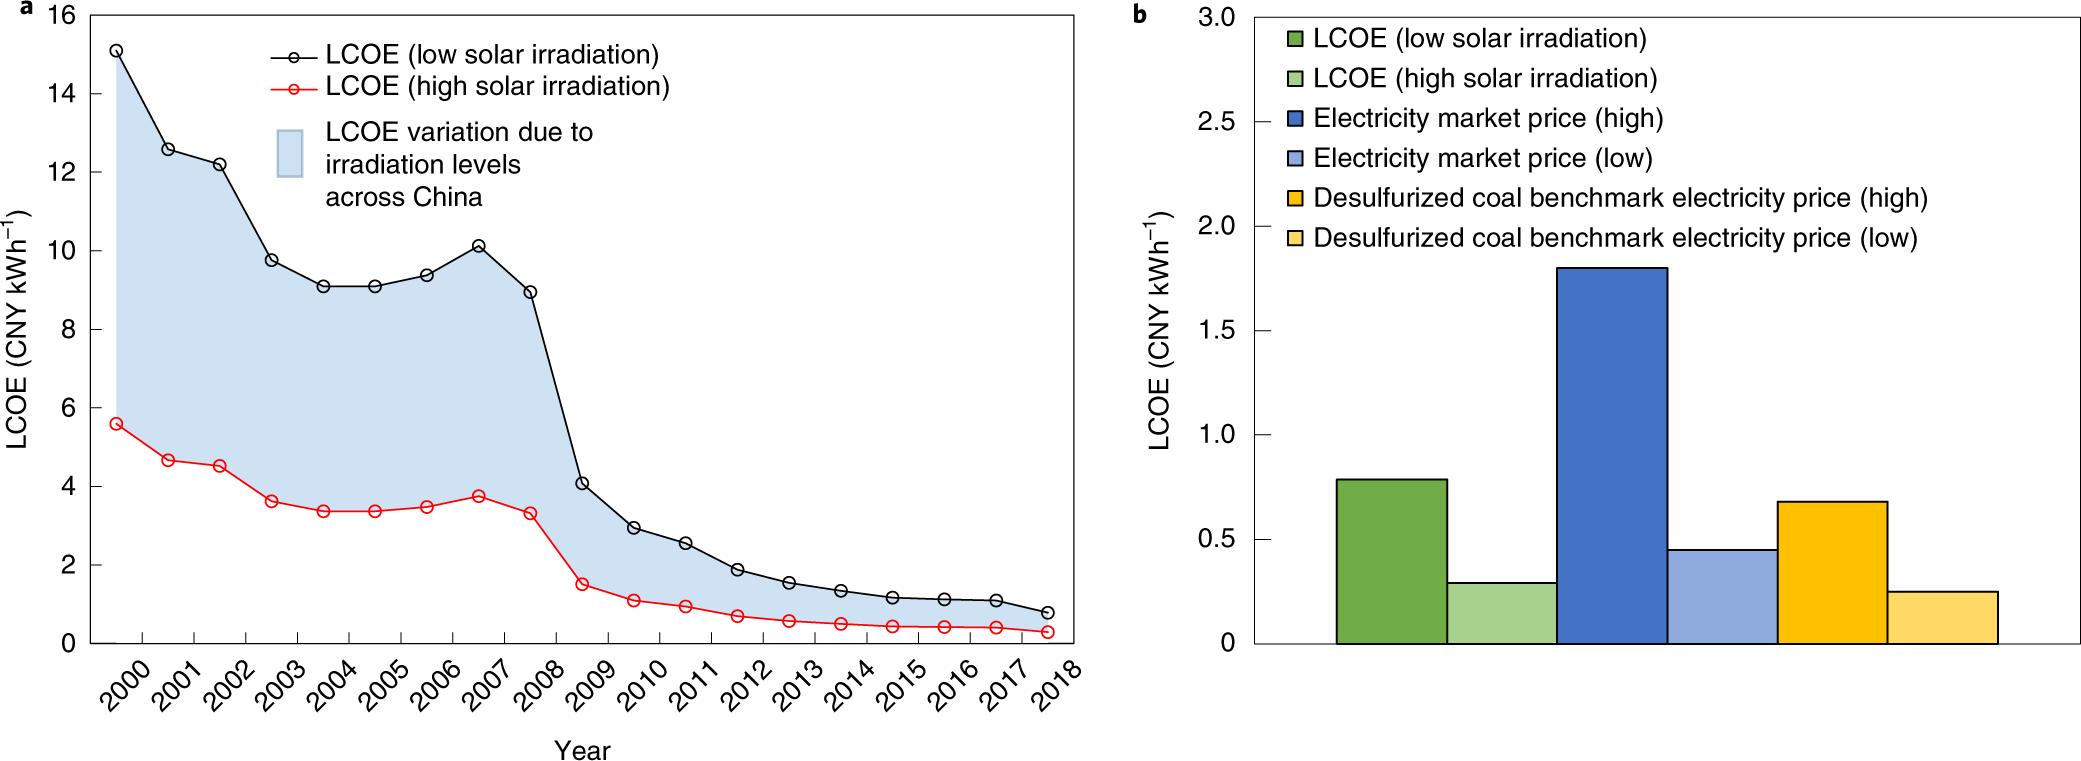 City-level analysis of subsidy-free solar photovoltaic